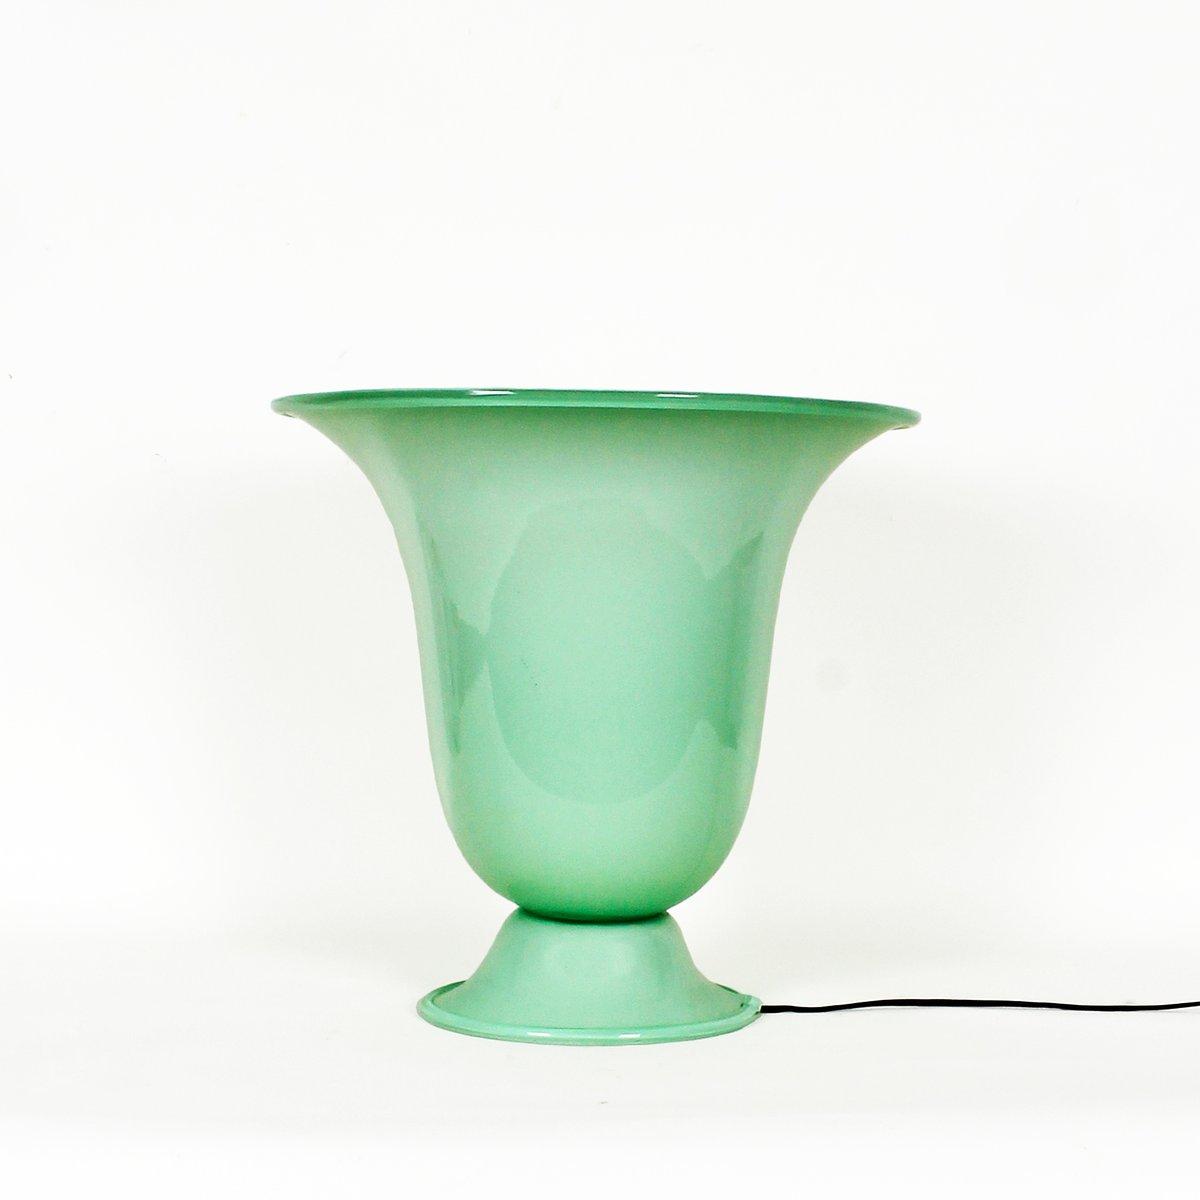 Opalglas Tischlampe, 1920er